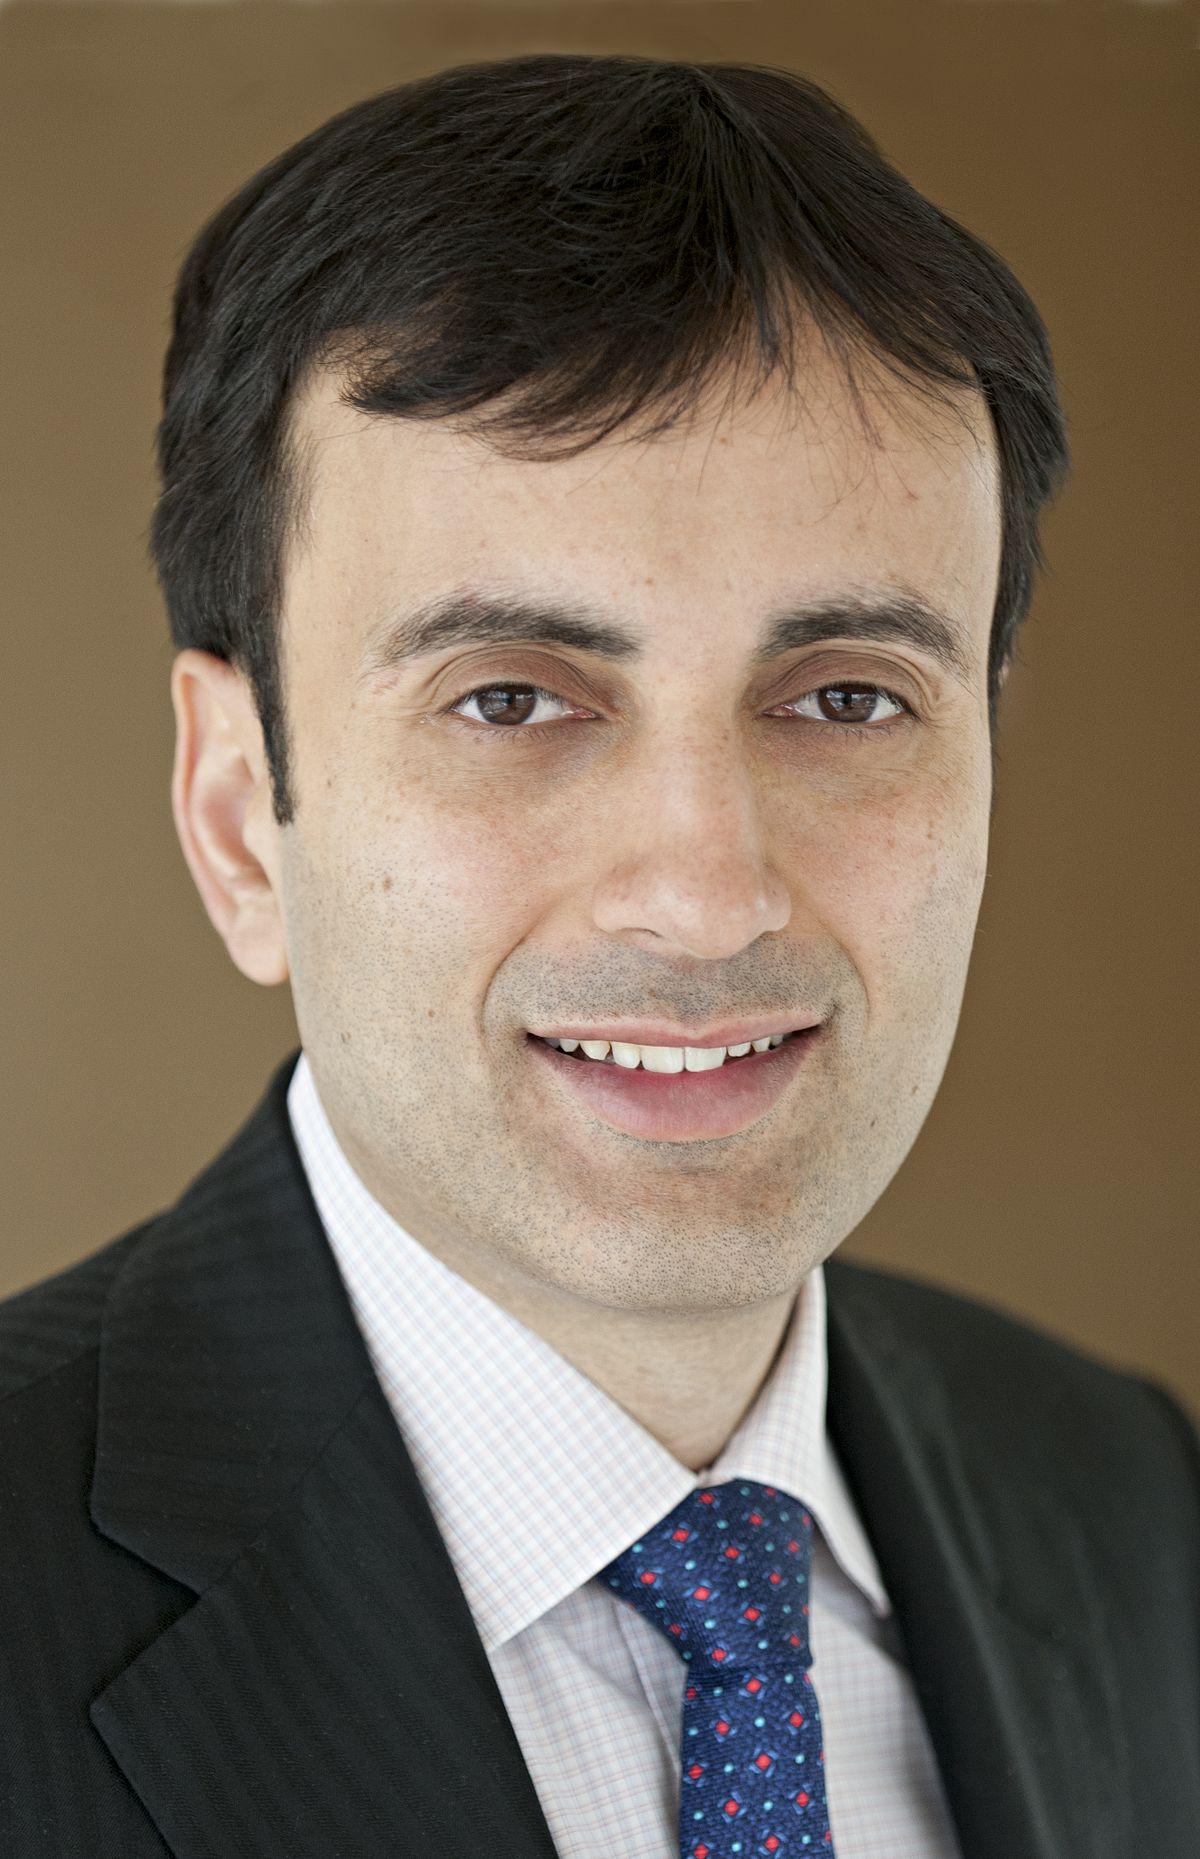 Ruchir Sharma - Wikipedia